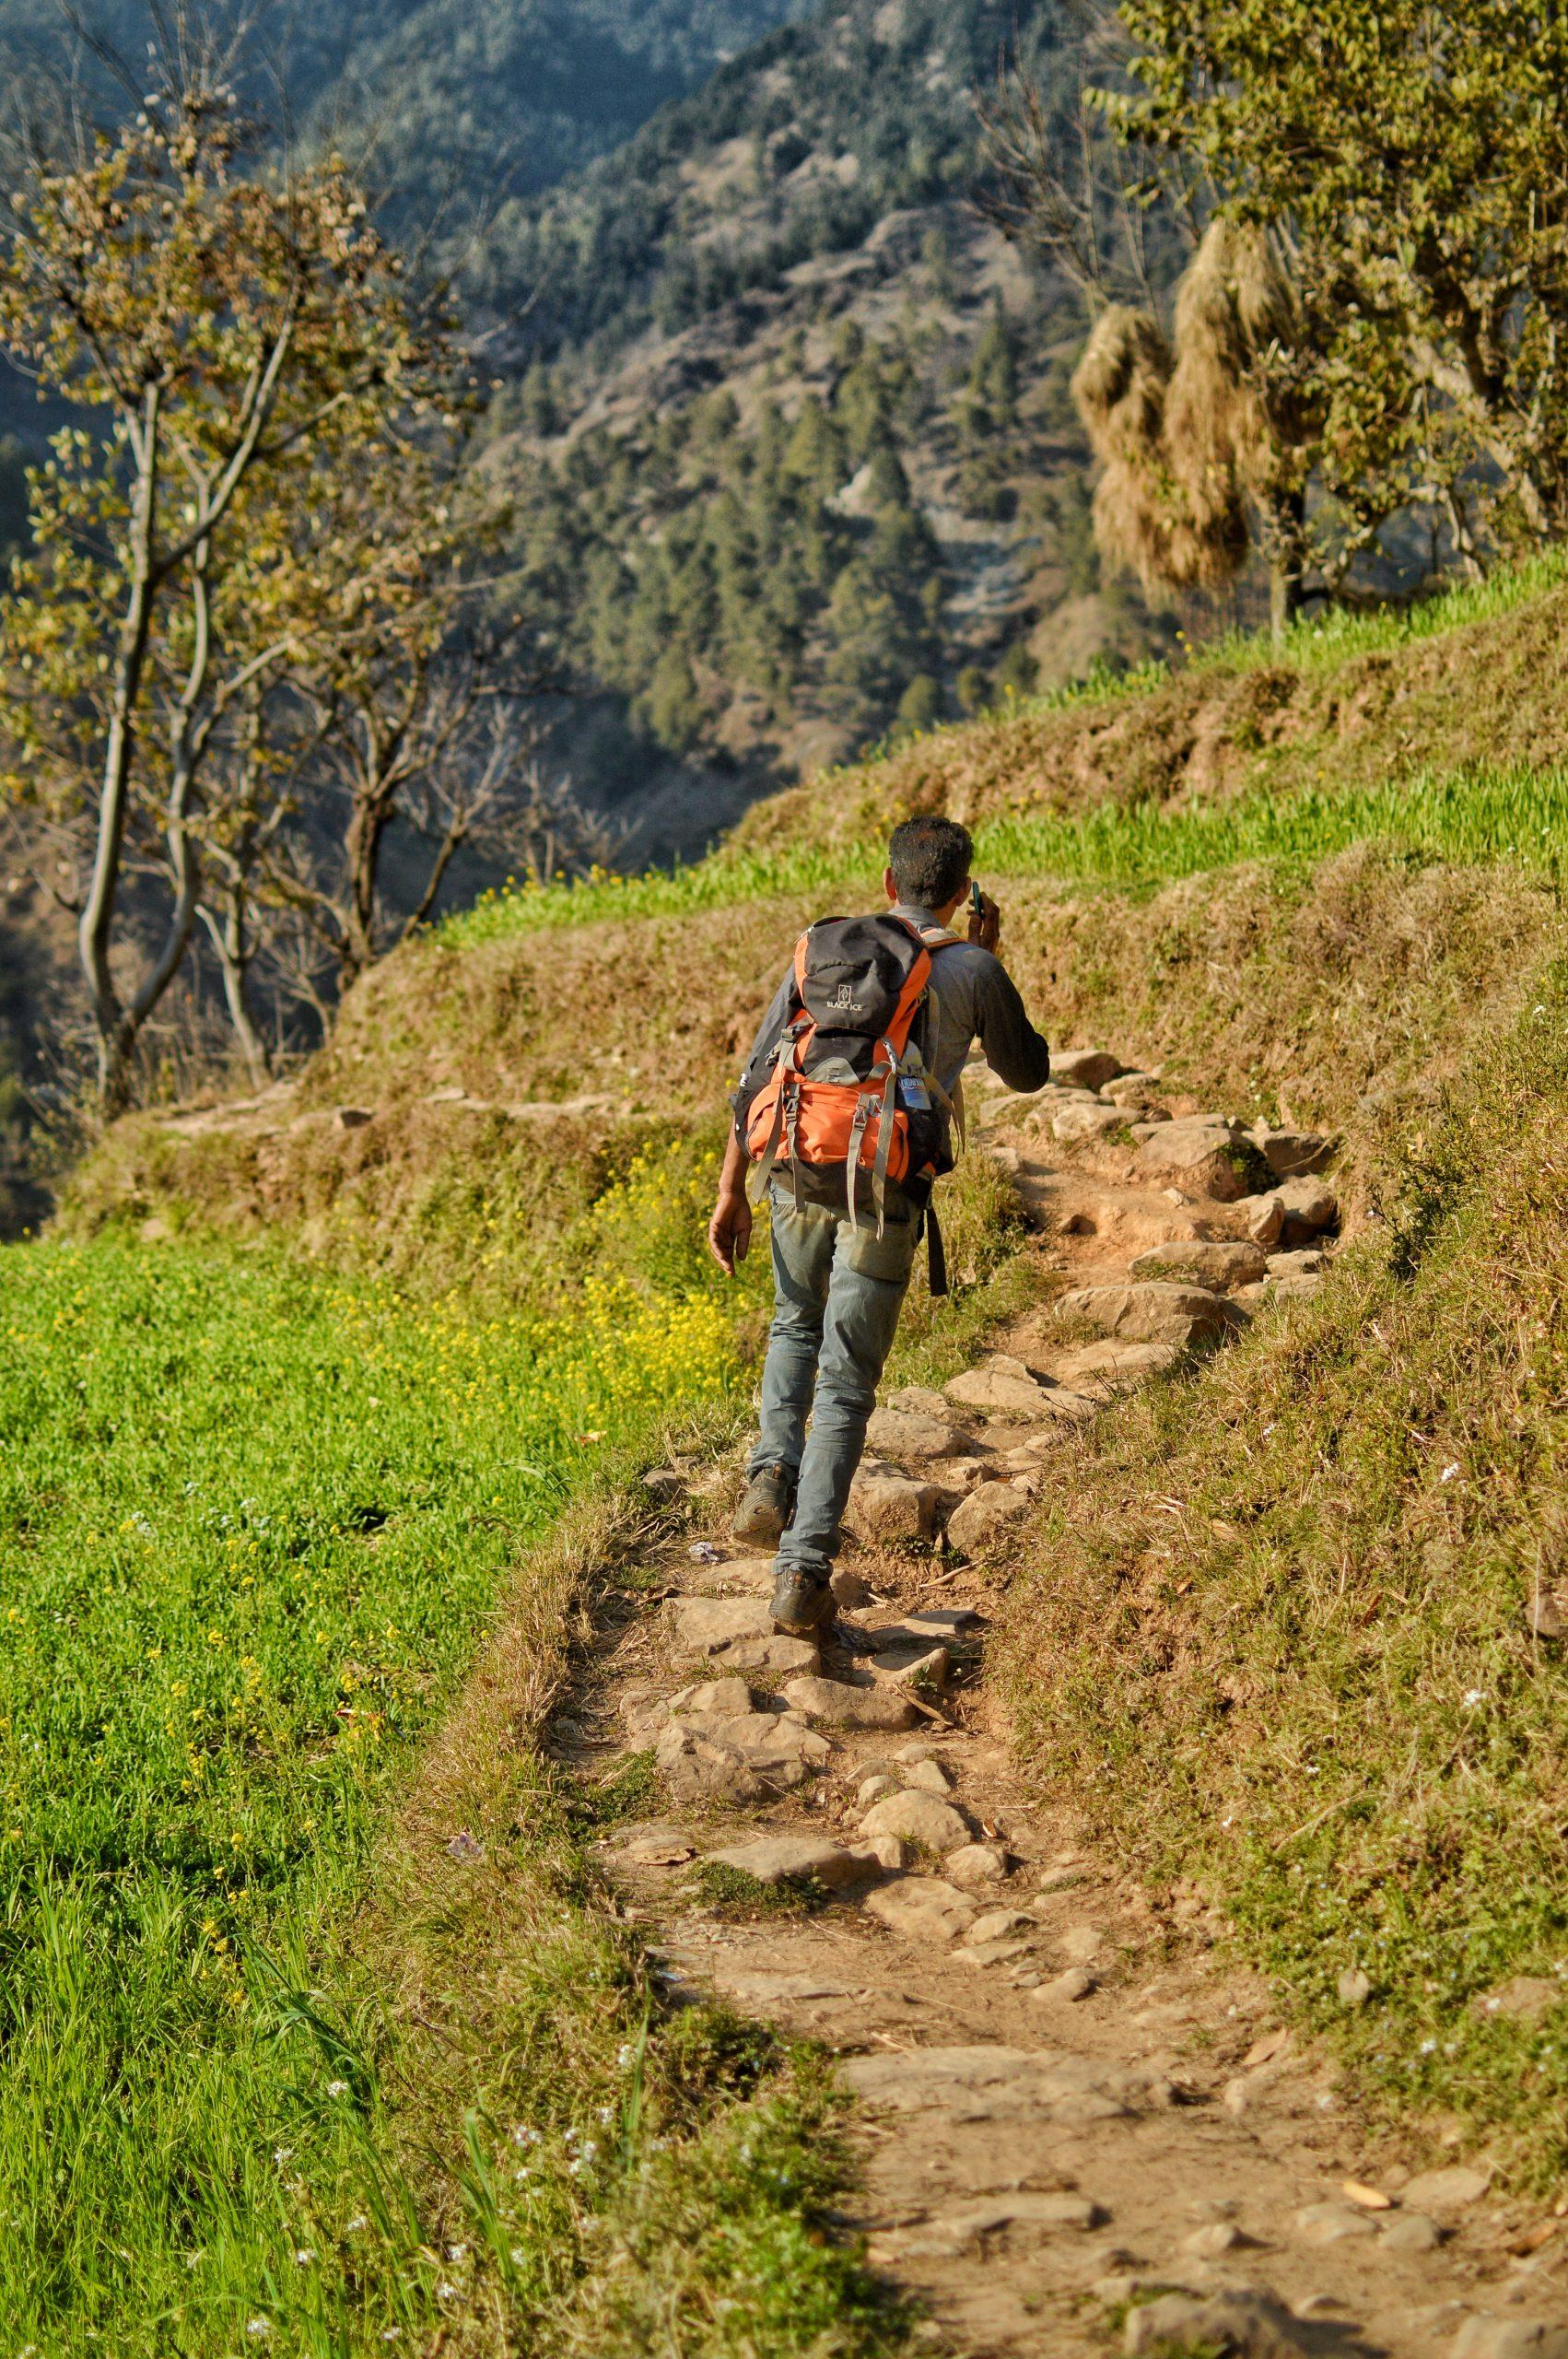 Boy trekking in the hills